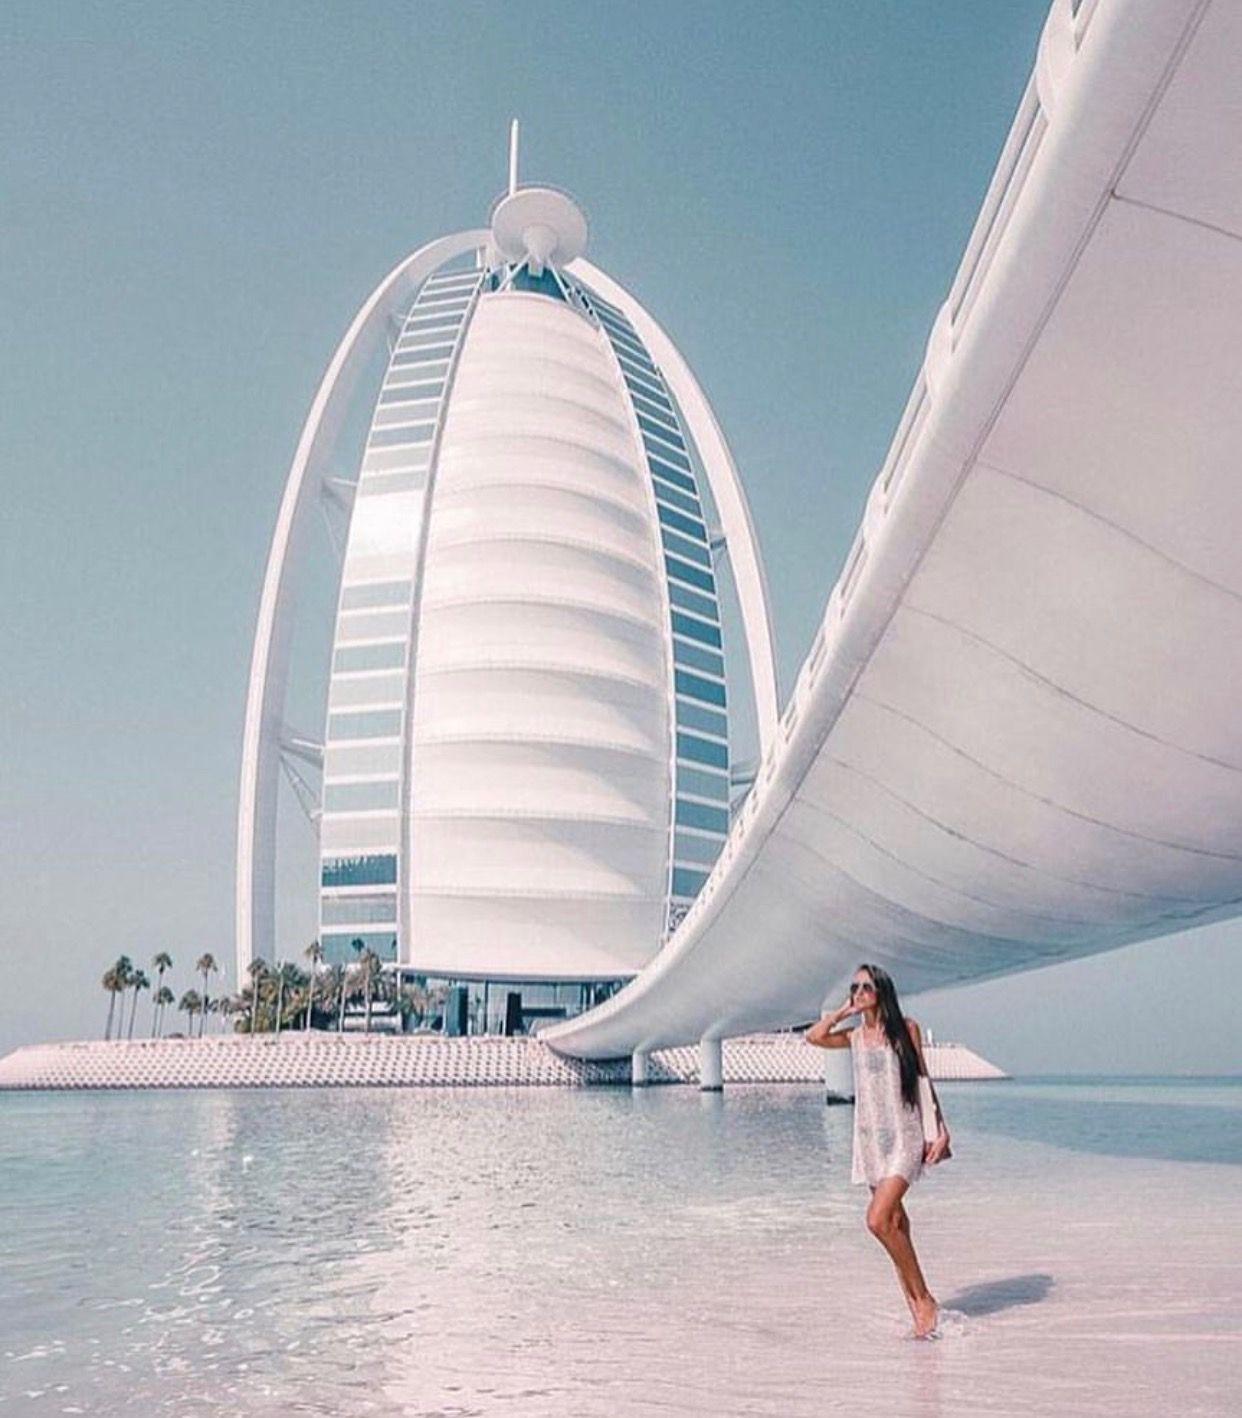 Burj Al Arab Monumentos Del Mundo Emiratos árabes Unidos Emiratos